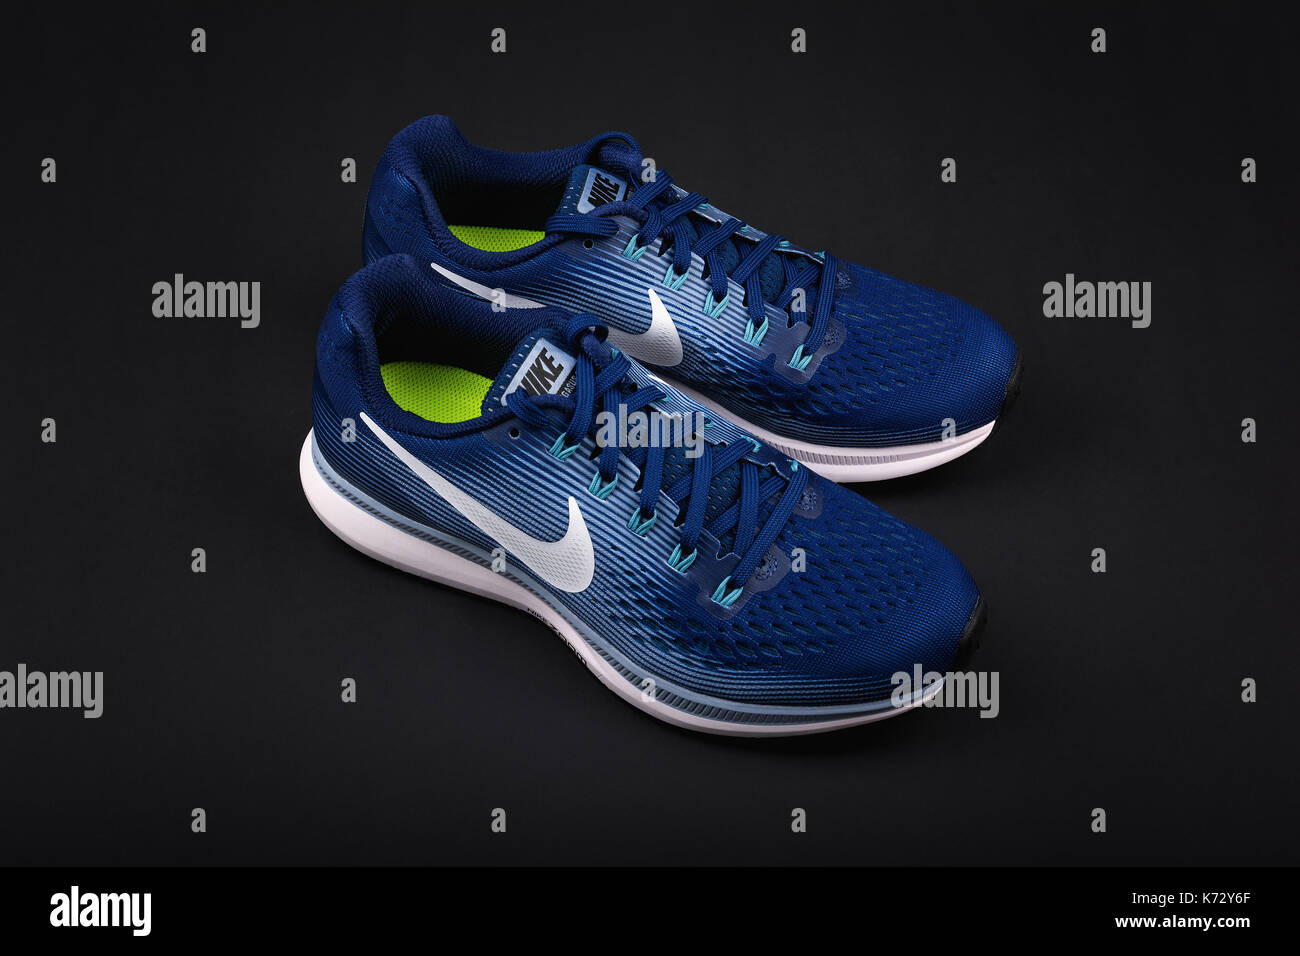 9c5ede6173318 Nike Running Stock Photos   Nike Running Stock Images - Alamy